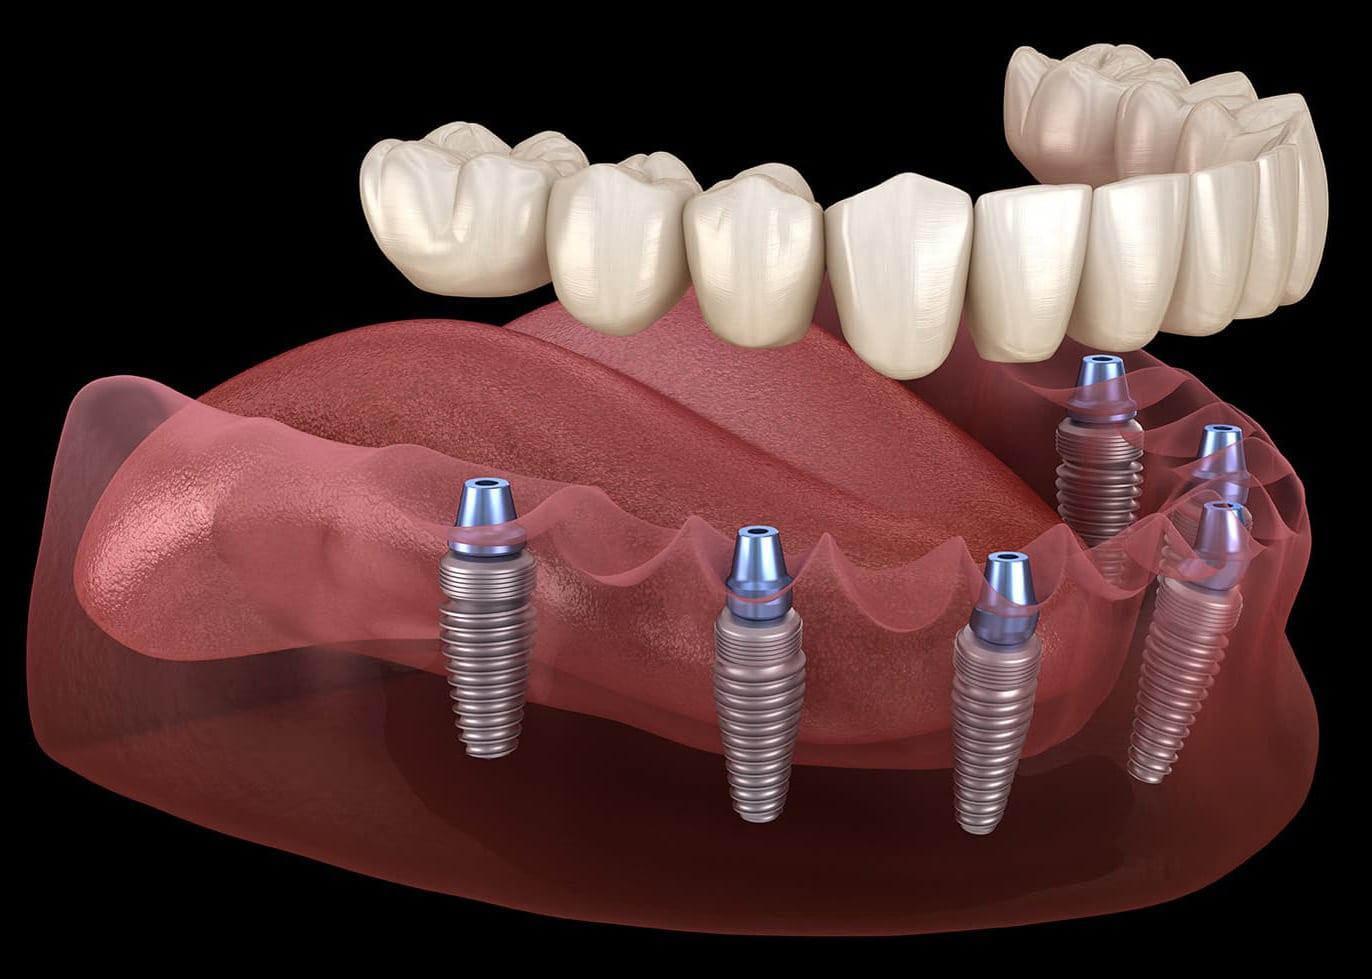 https://ml2sycfl8irw.i.optimole.com/kPMk_hE-E3B3-RRy/w:1280/h:640/q:75/rt:fill/g:ce/https://www.lifedentalspa.ro/wp-content/uploads/2021/05/implante-dental-carga-inmediata.jpg